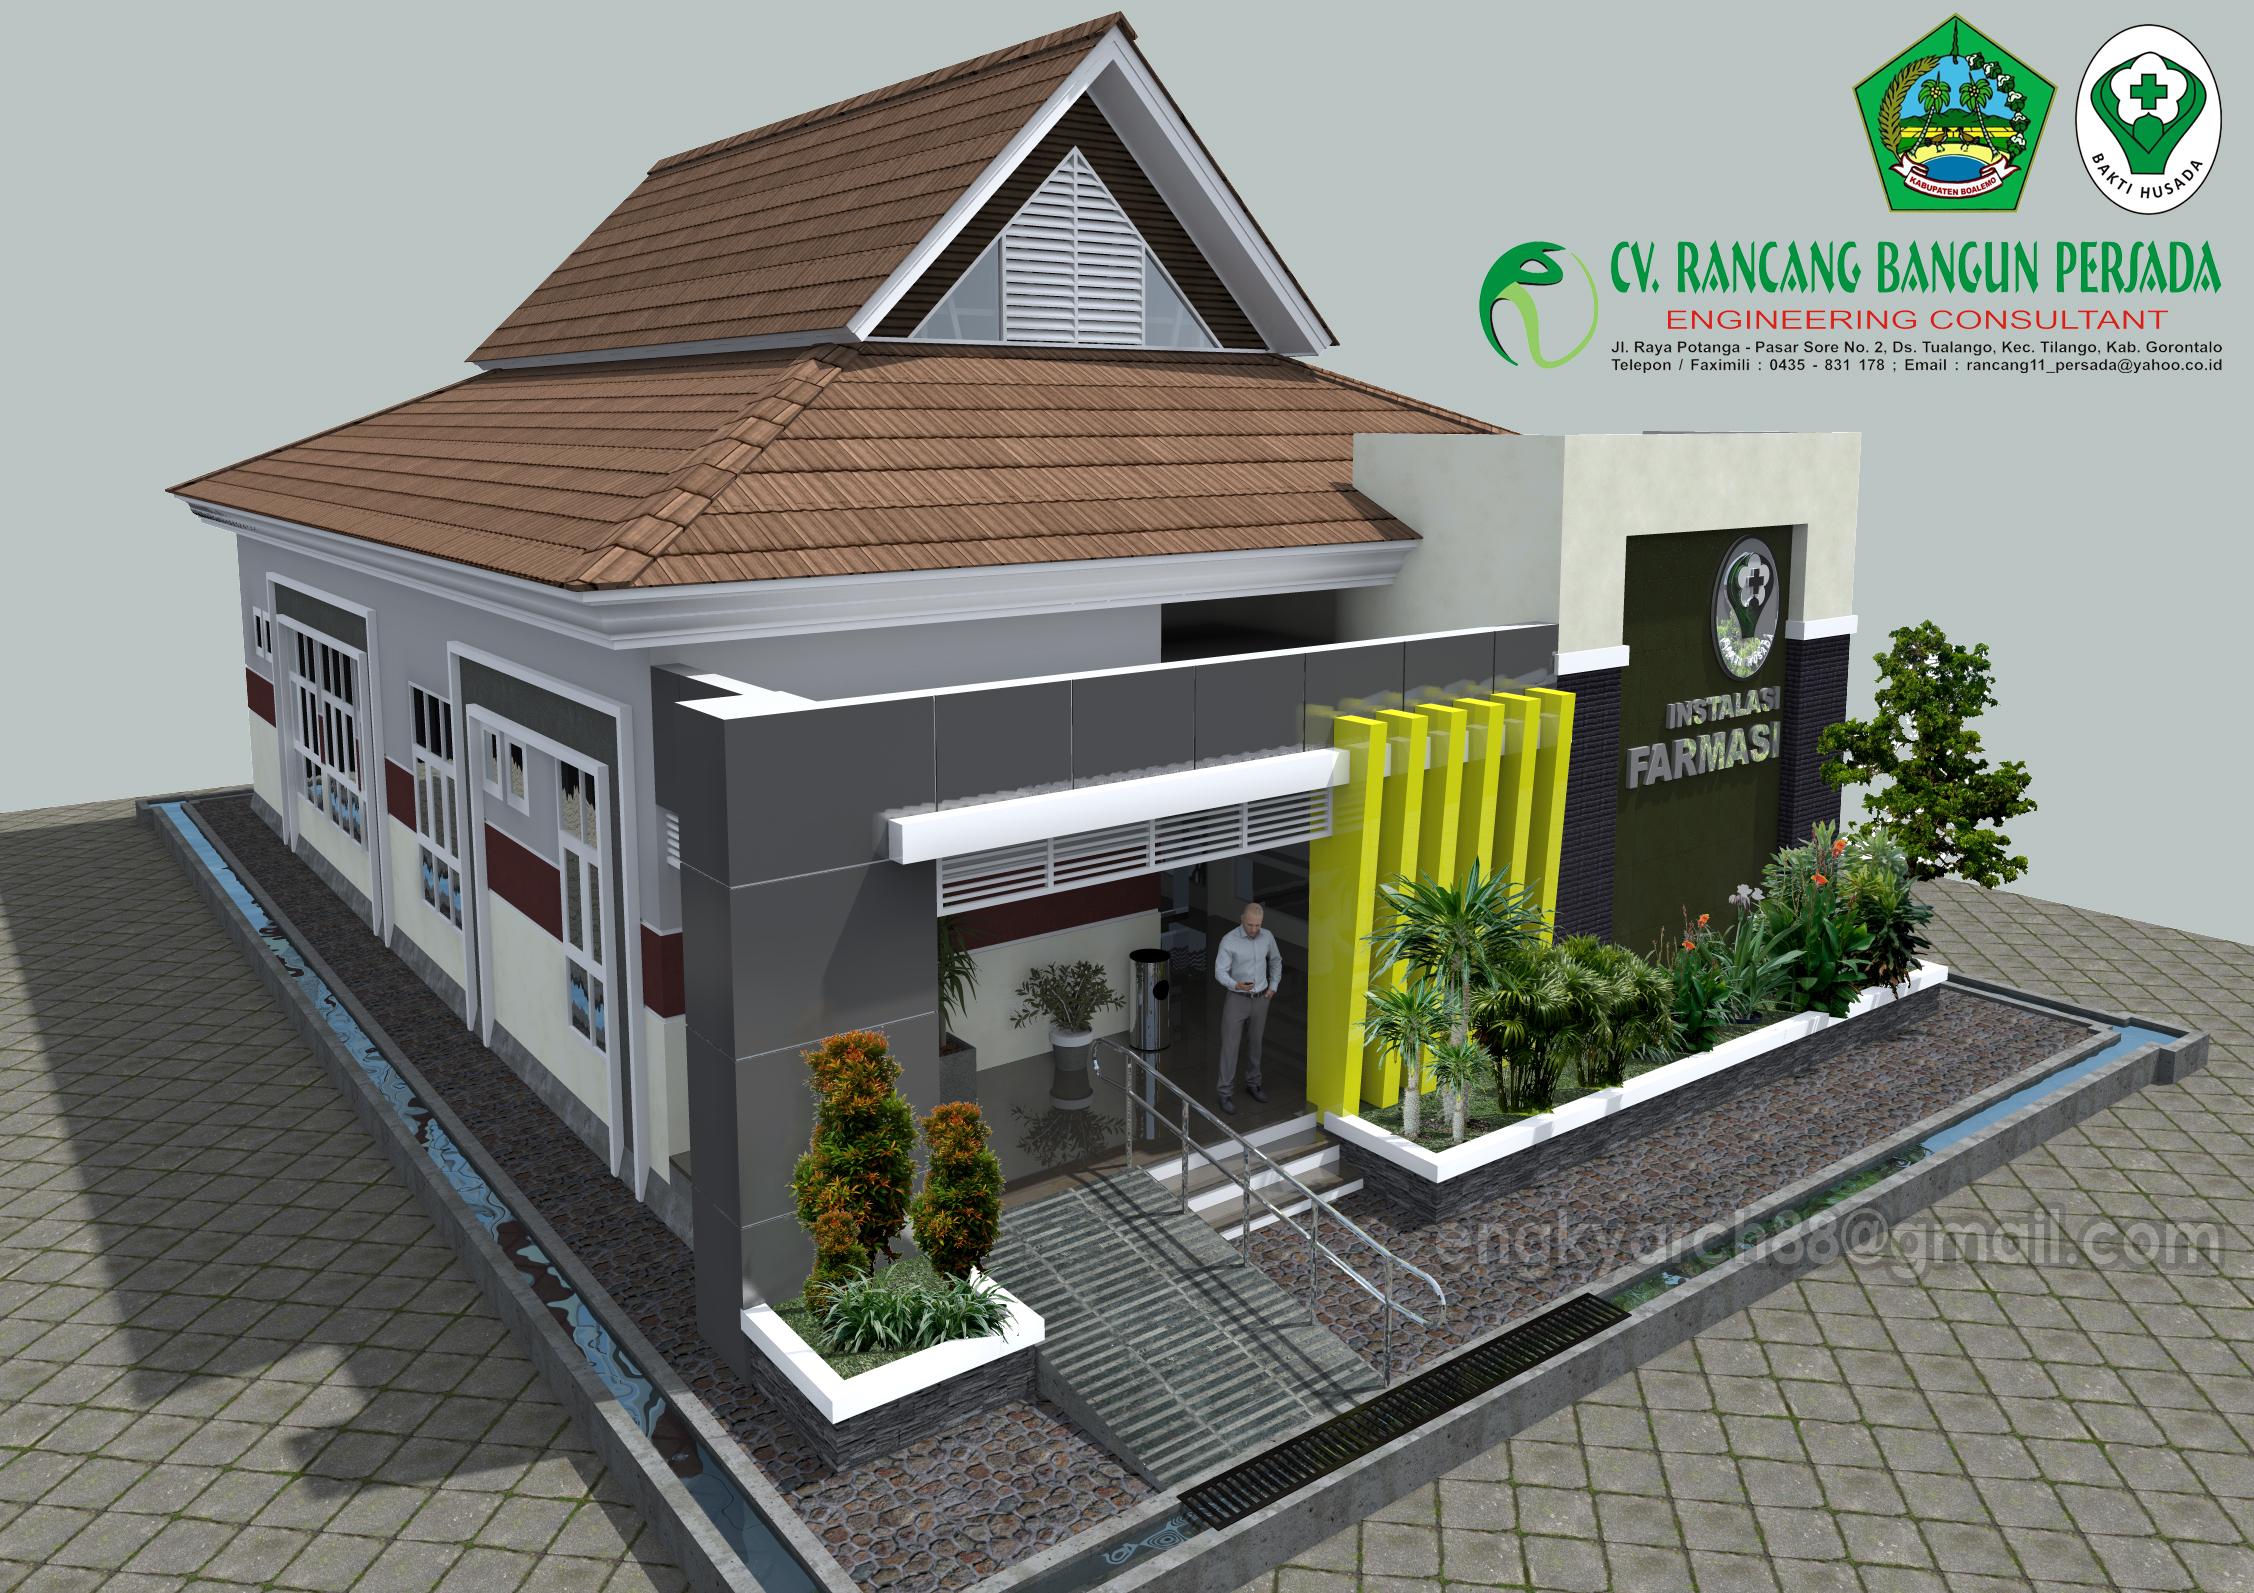 Ded Gedung Instalasi Farmasi Rumah Sakit Pratama Kab Boalemo Banyu